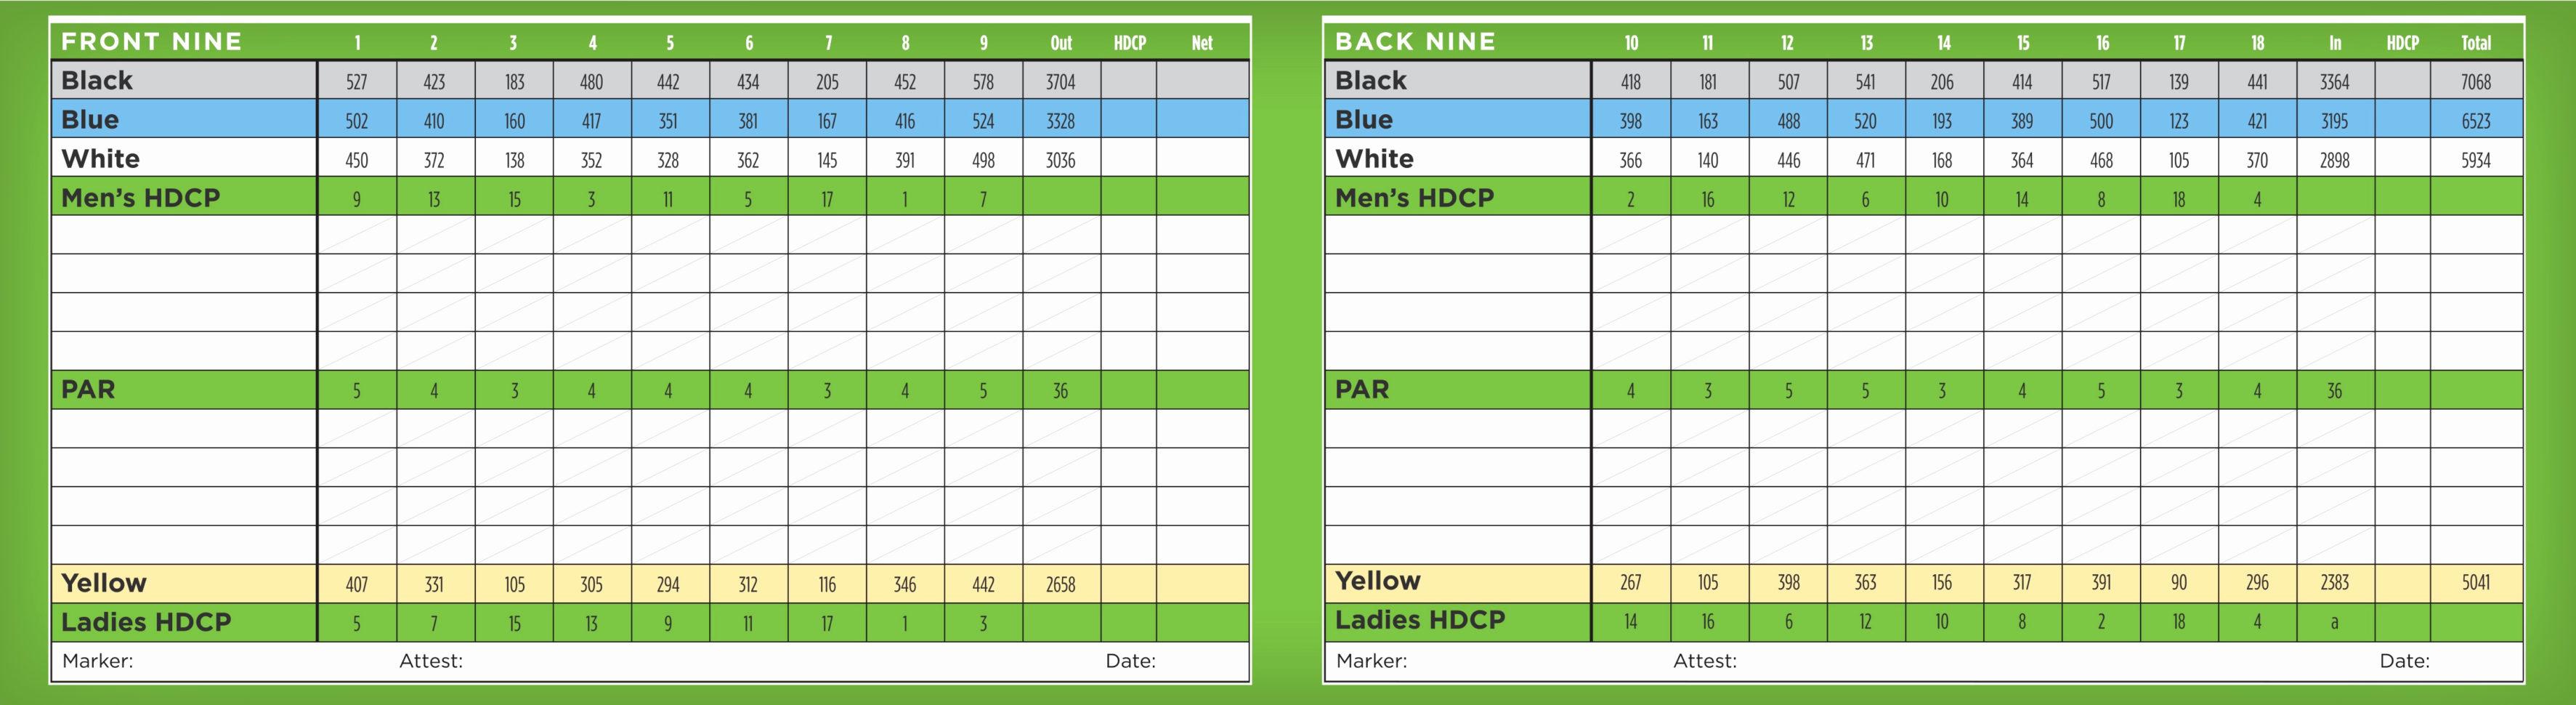 Golf Score Tracking Spreadsheet Best Of Golf Stat Tracker With Golf Stat Tracker Spreadsheet